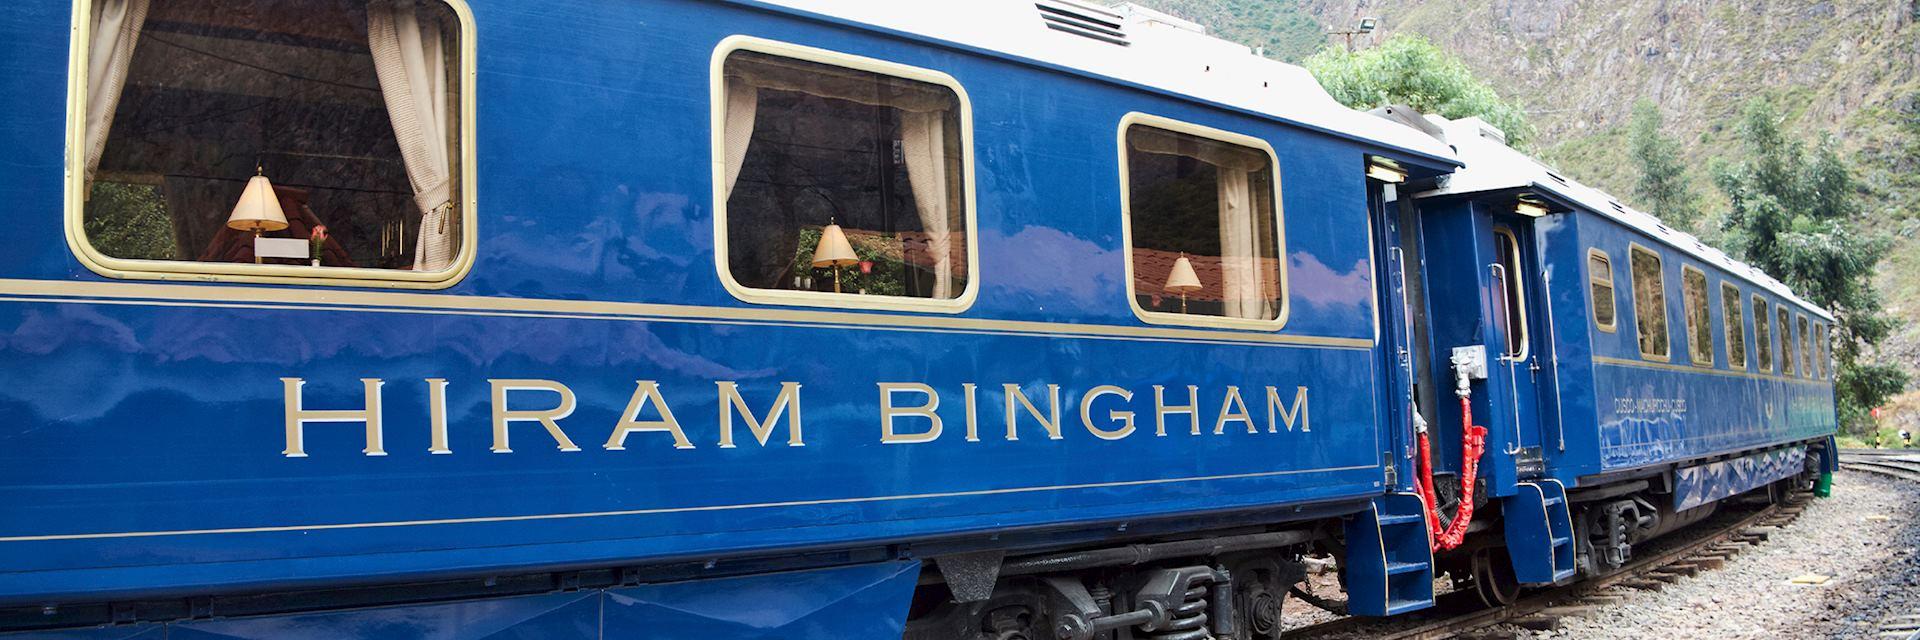 Hiram Bingham train, South America